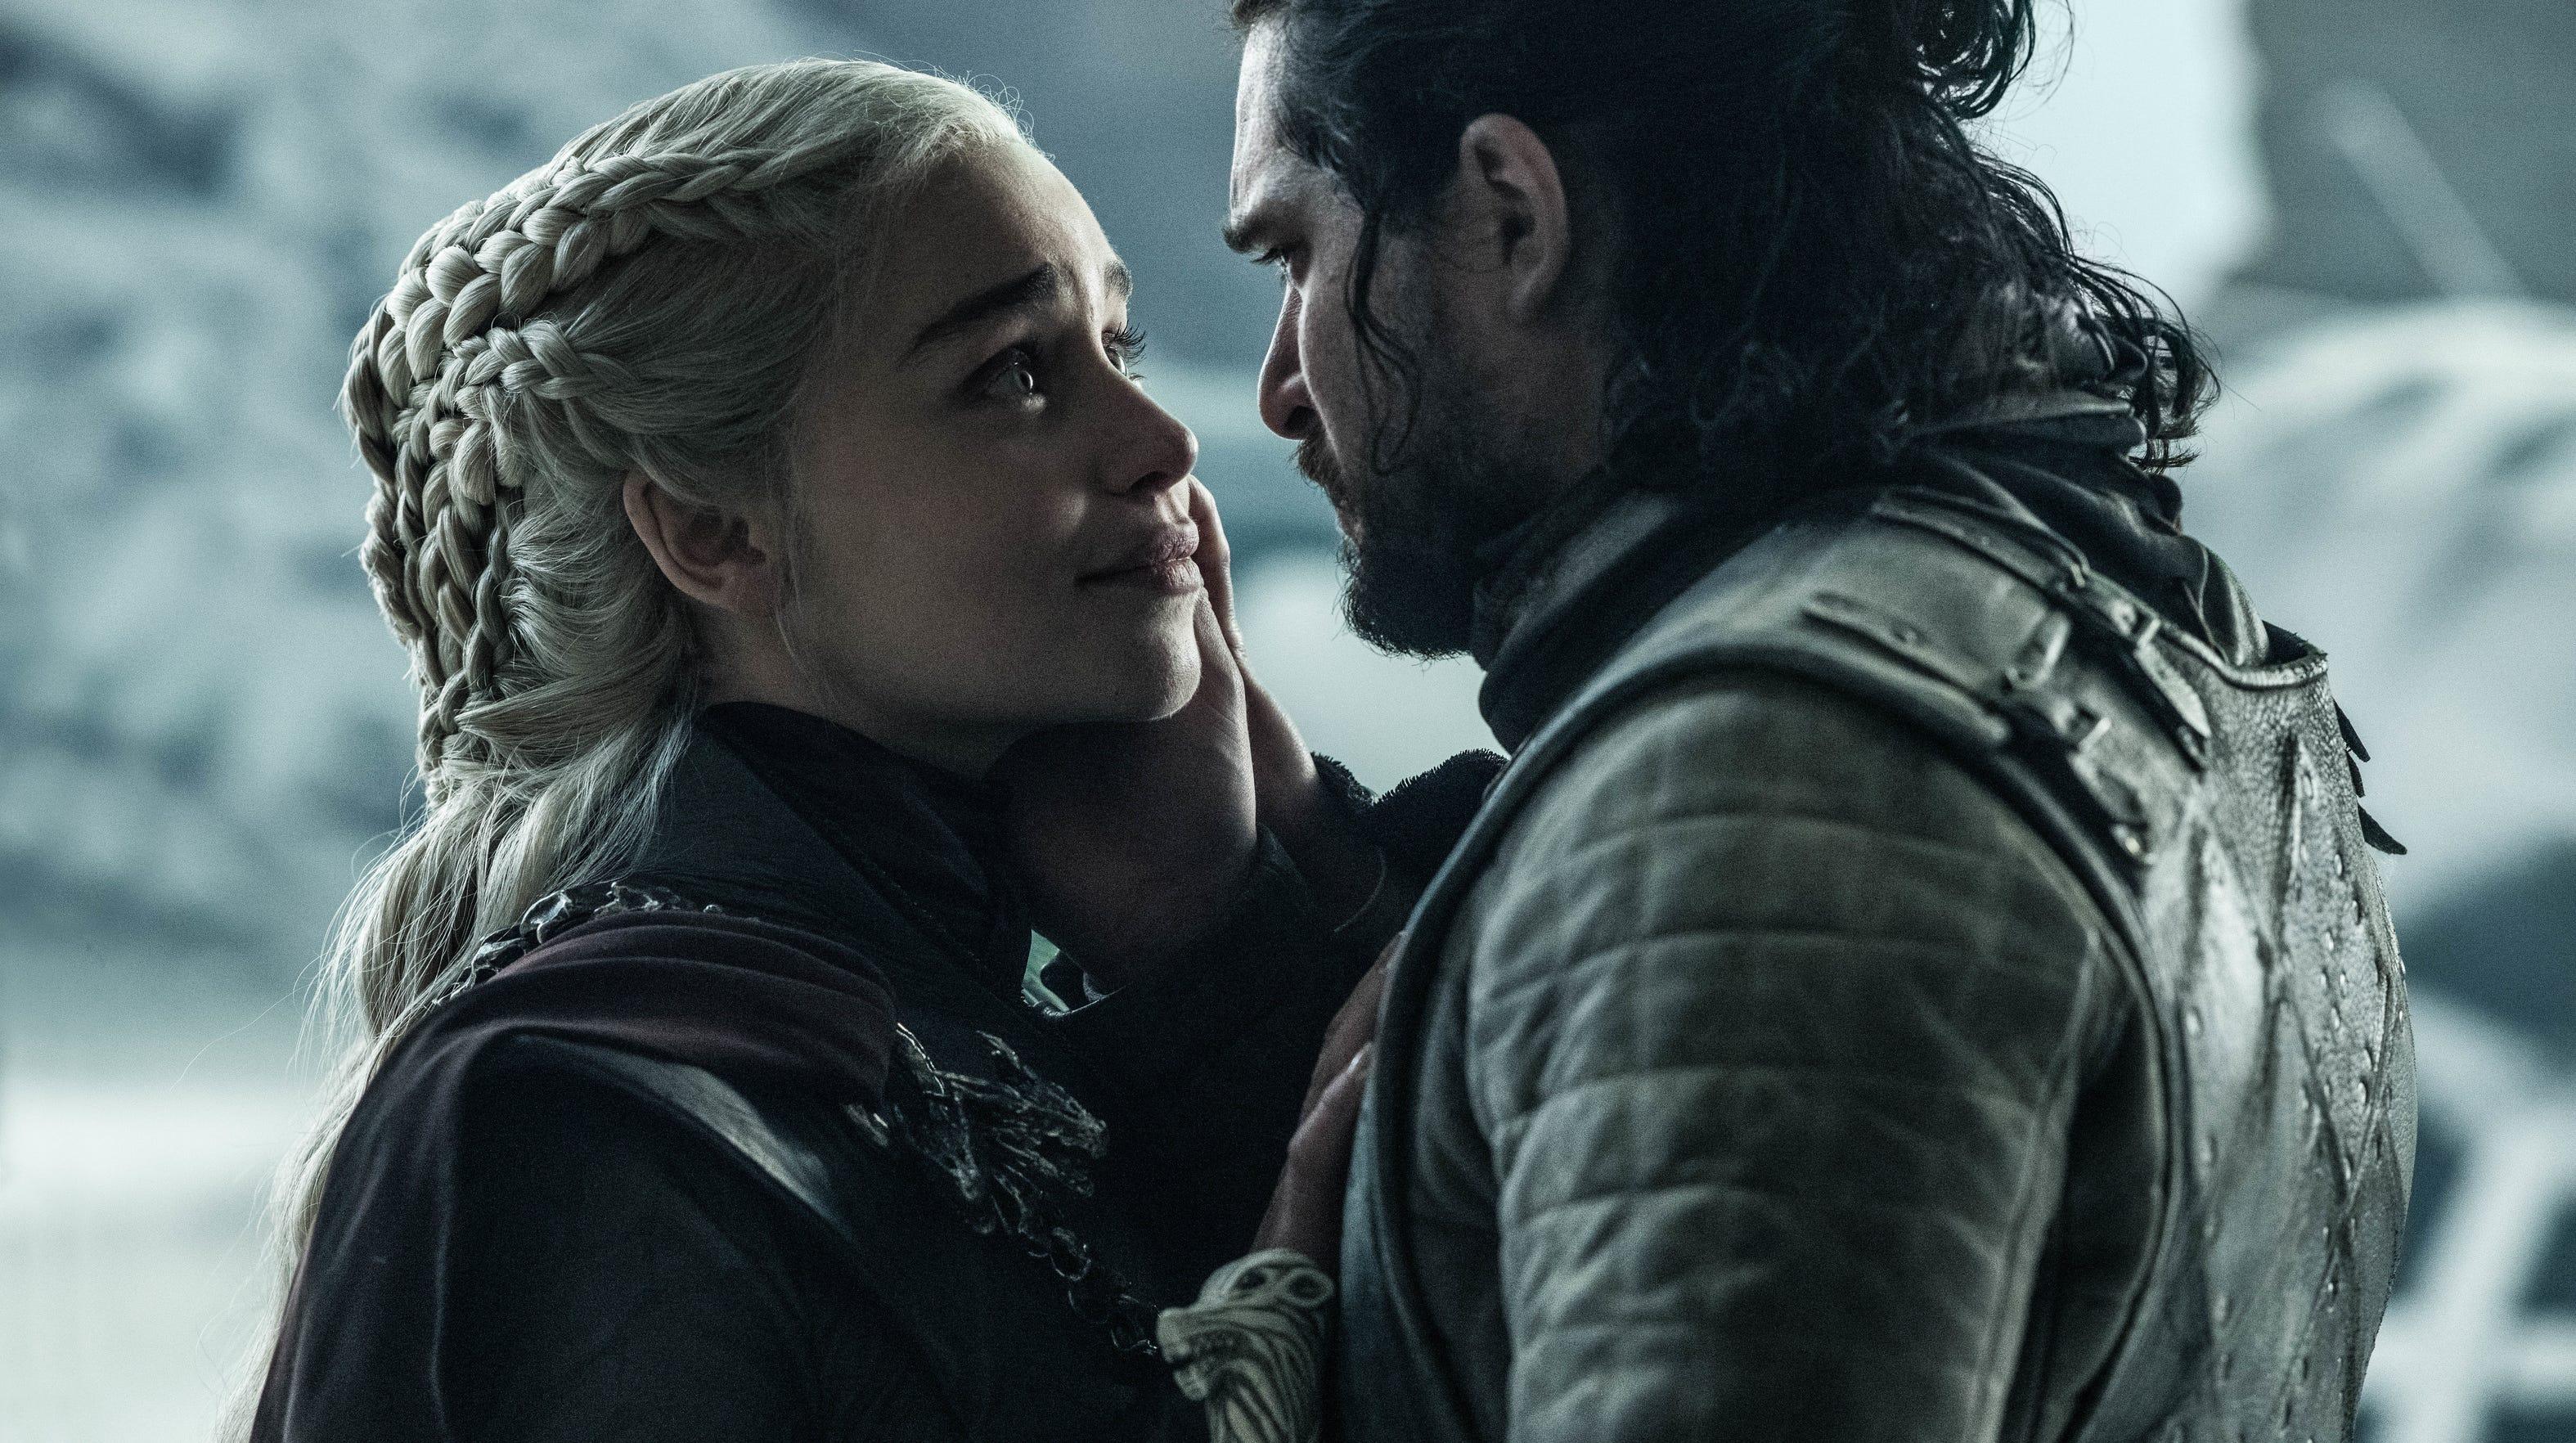 Danerys Targaryen (Emilia Clarke), left, and Jon Snow (Kit Harington) have their final embrace.